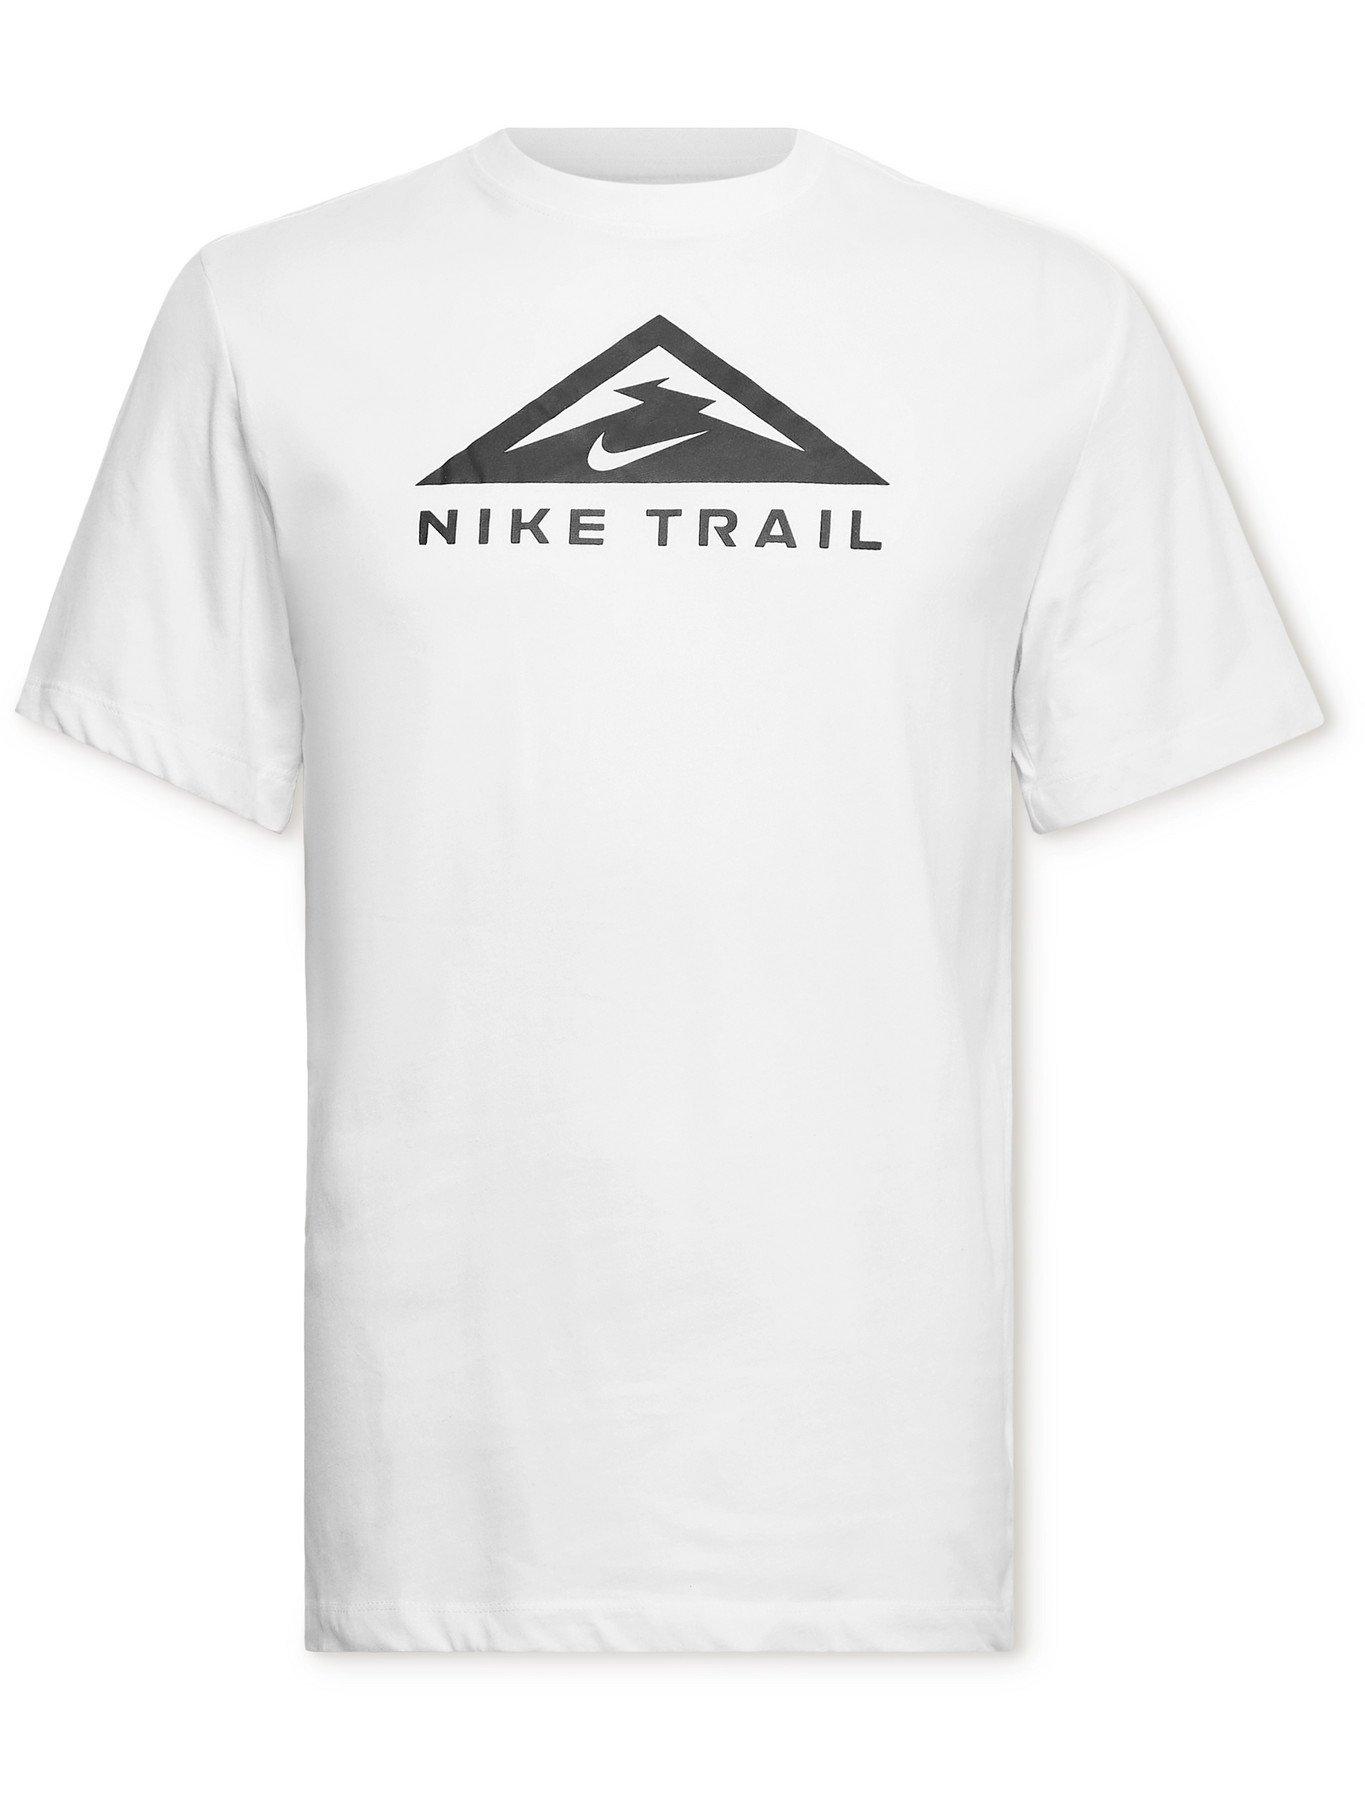 Photo: NIKE RUNNING - Trail Logo-Print Dri-FIT Cotton-Blend Jersey T-Shirt - White - M